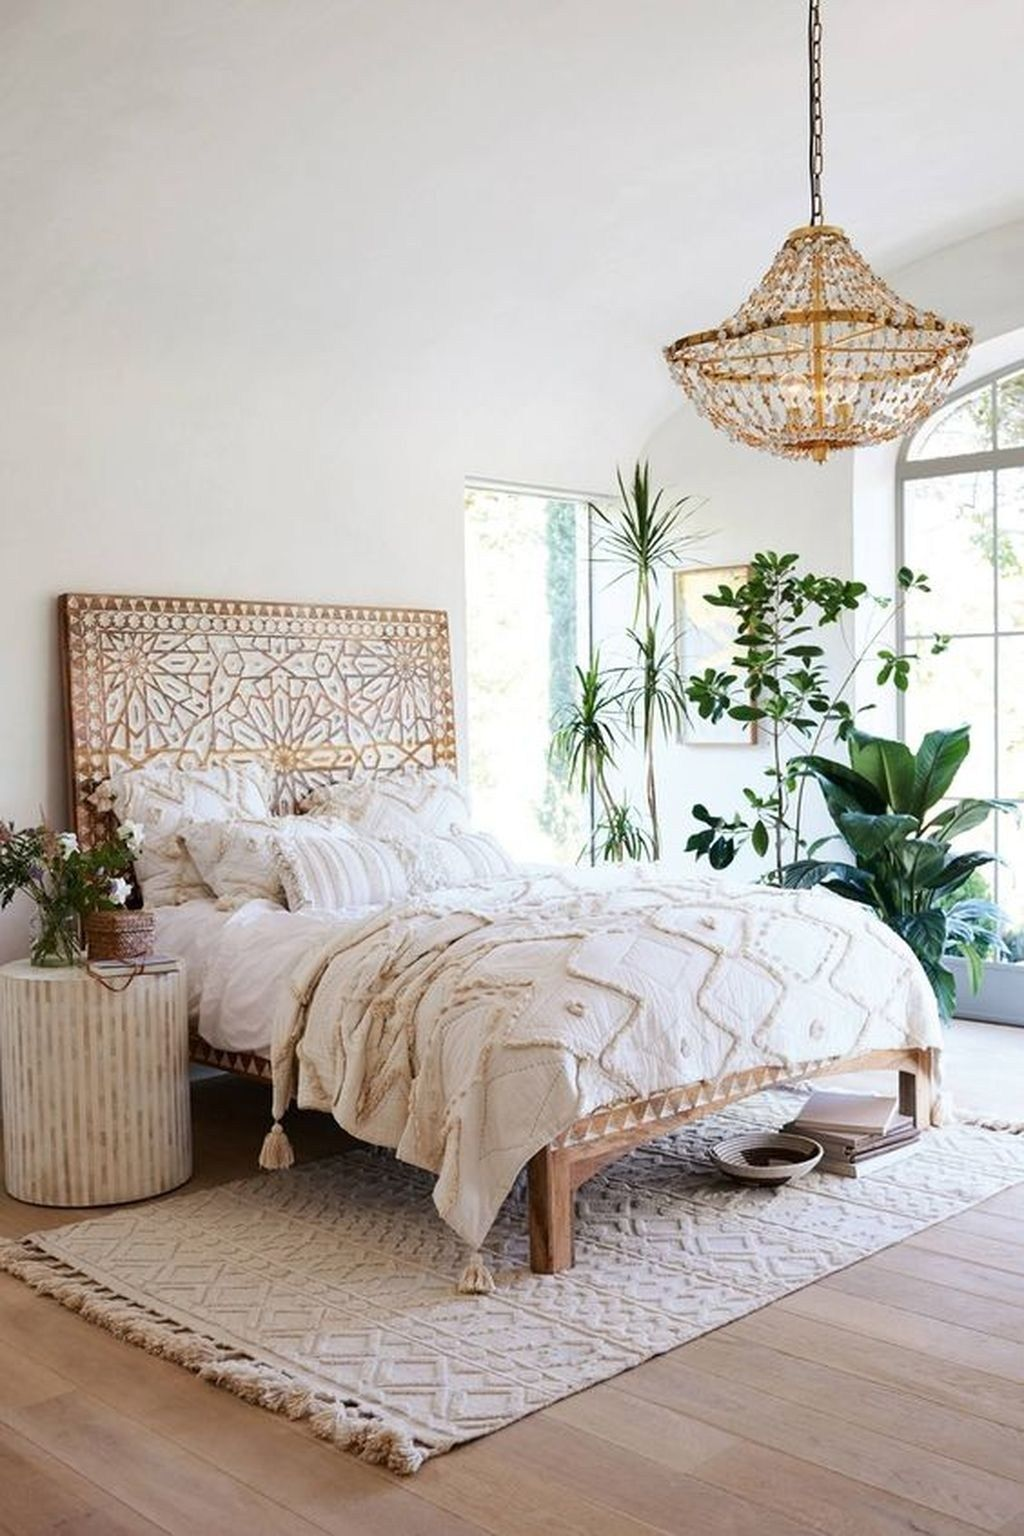 30 The Best Modern Bohemian Bedrooms Ideas Home Design Home Decor Bedroom Bedroom Interior Bedroom Decor